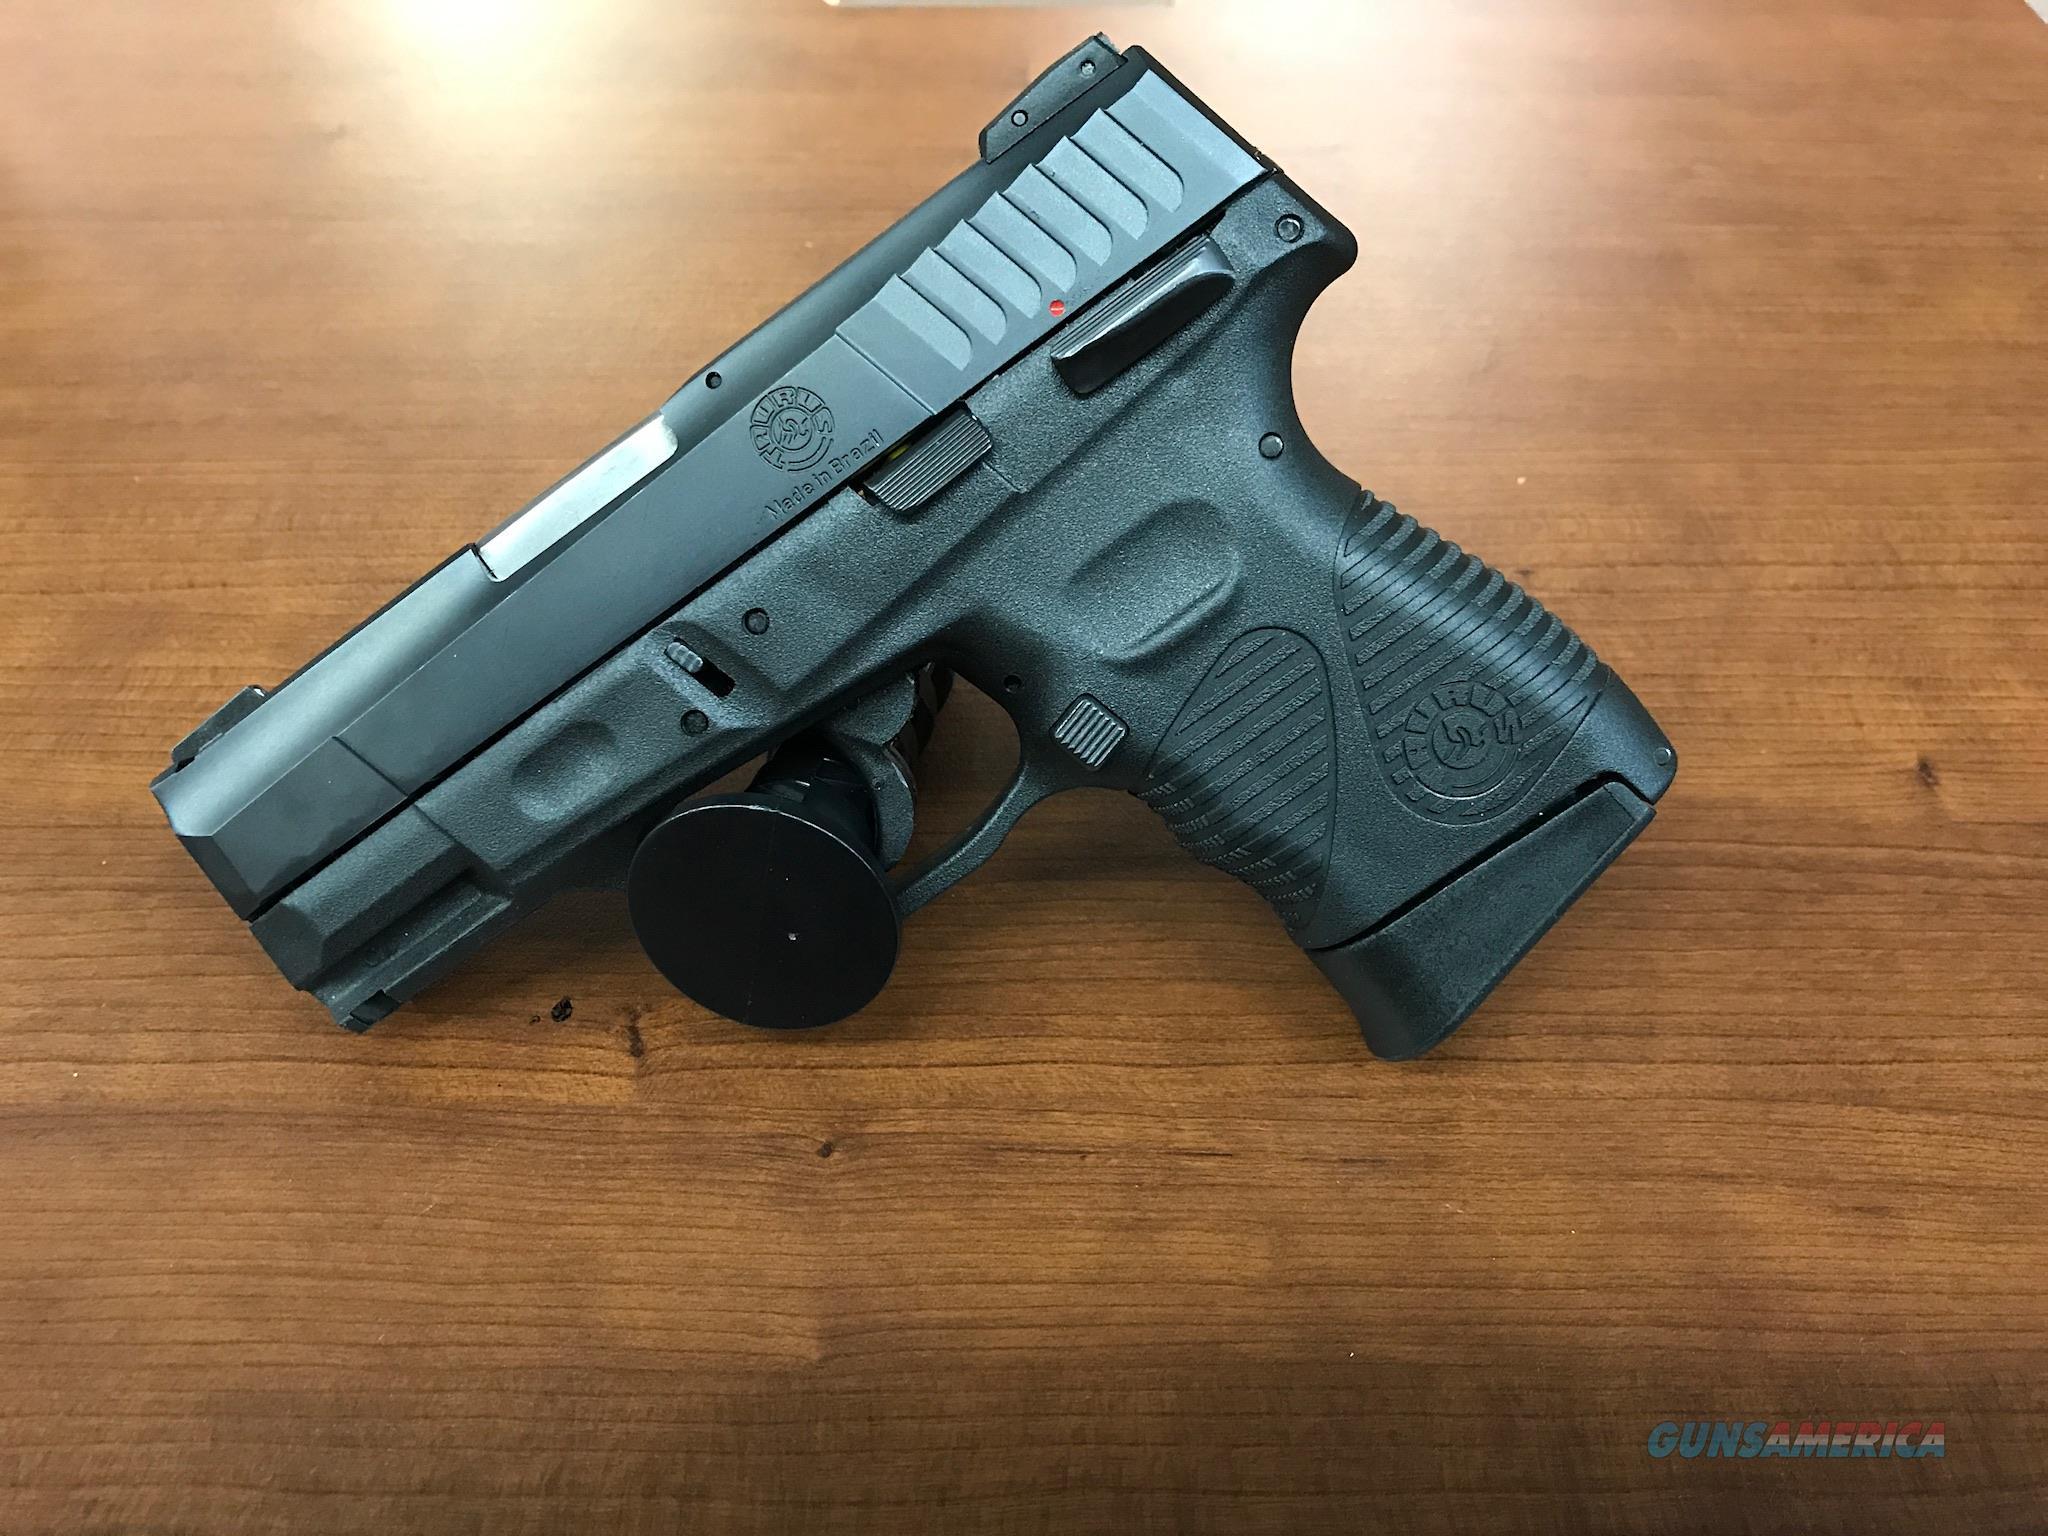 Taurus 24/7 G2C 9mm Used  Guns > Pistols > Taurus Pistols > Semi Auto Pistols > Polymer Frame